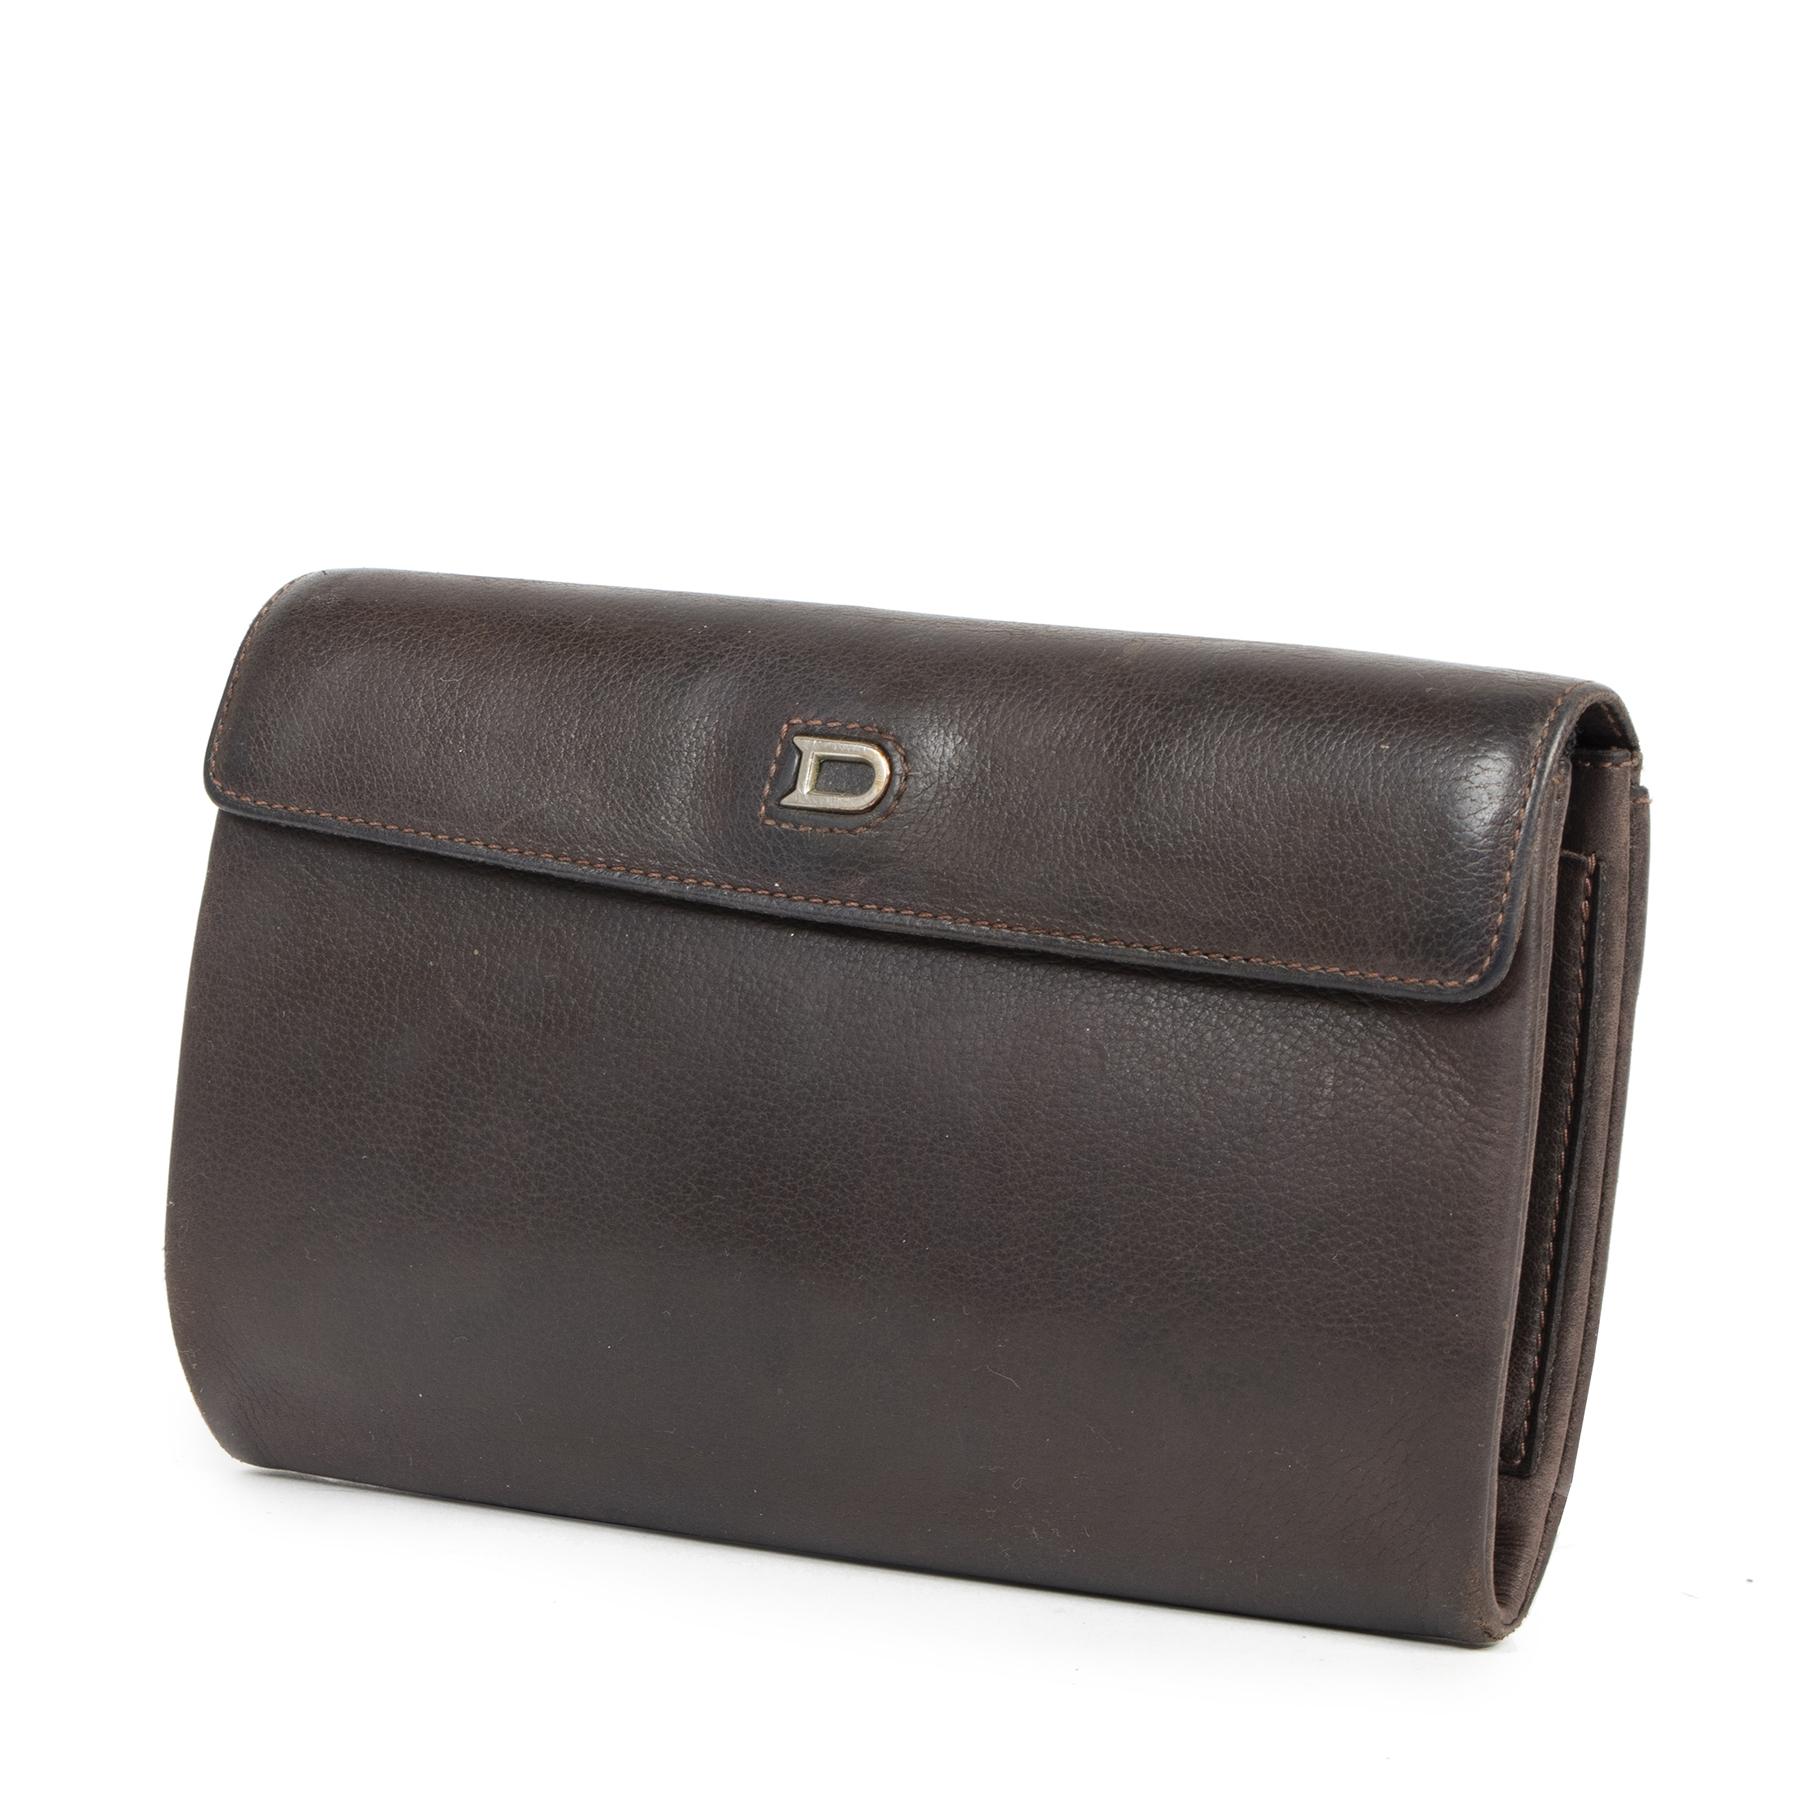 Authentic secondhand Delvaux Brown Leather Wallet Pouch designer bags luxury vintage webshop fashion safe secure online shopping